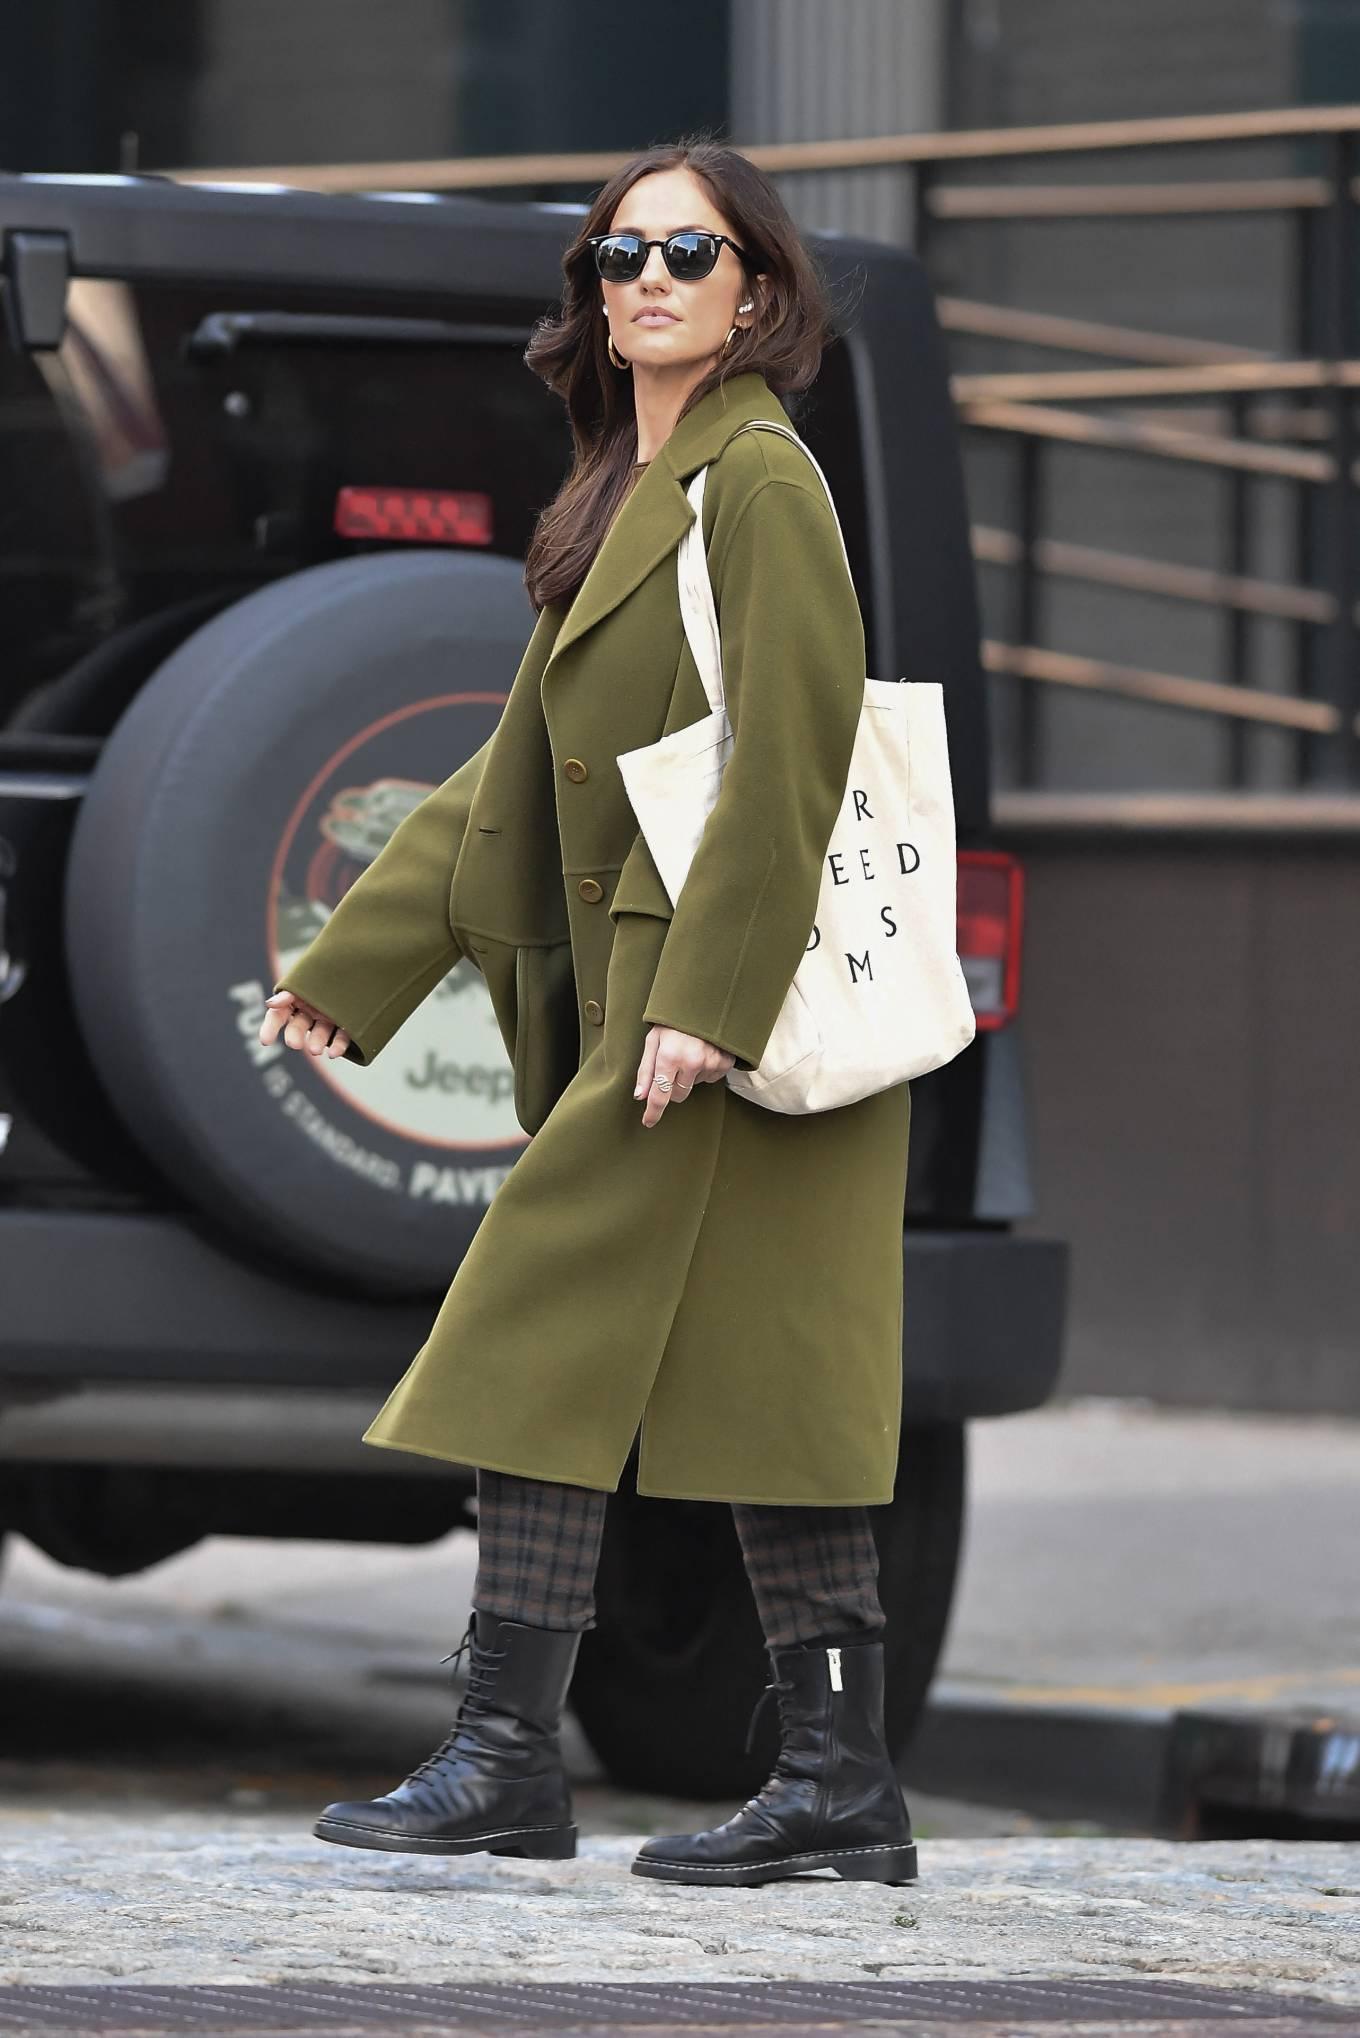 Minka Kelly 2021 : Minka Kelly – In olive green runs errands in New York-04